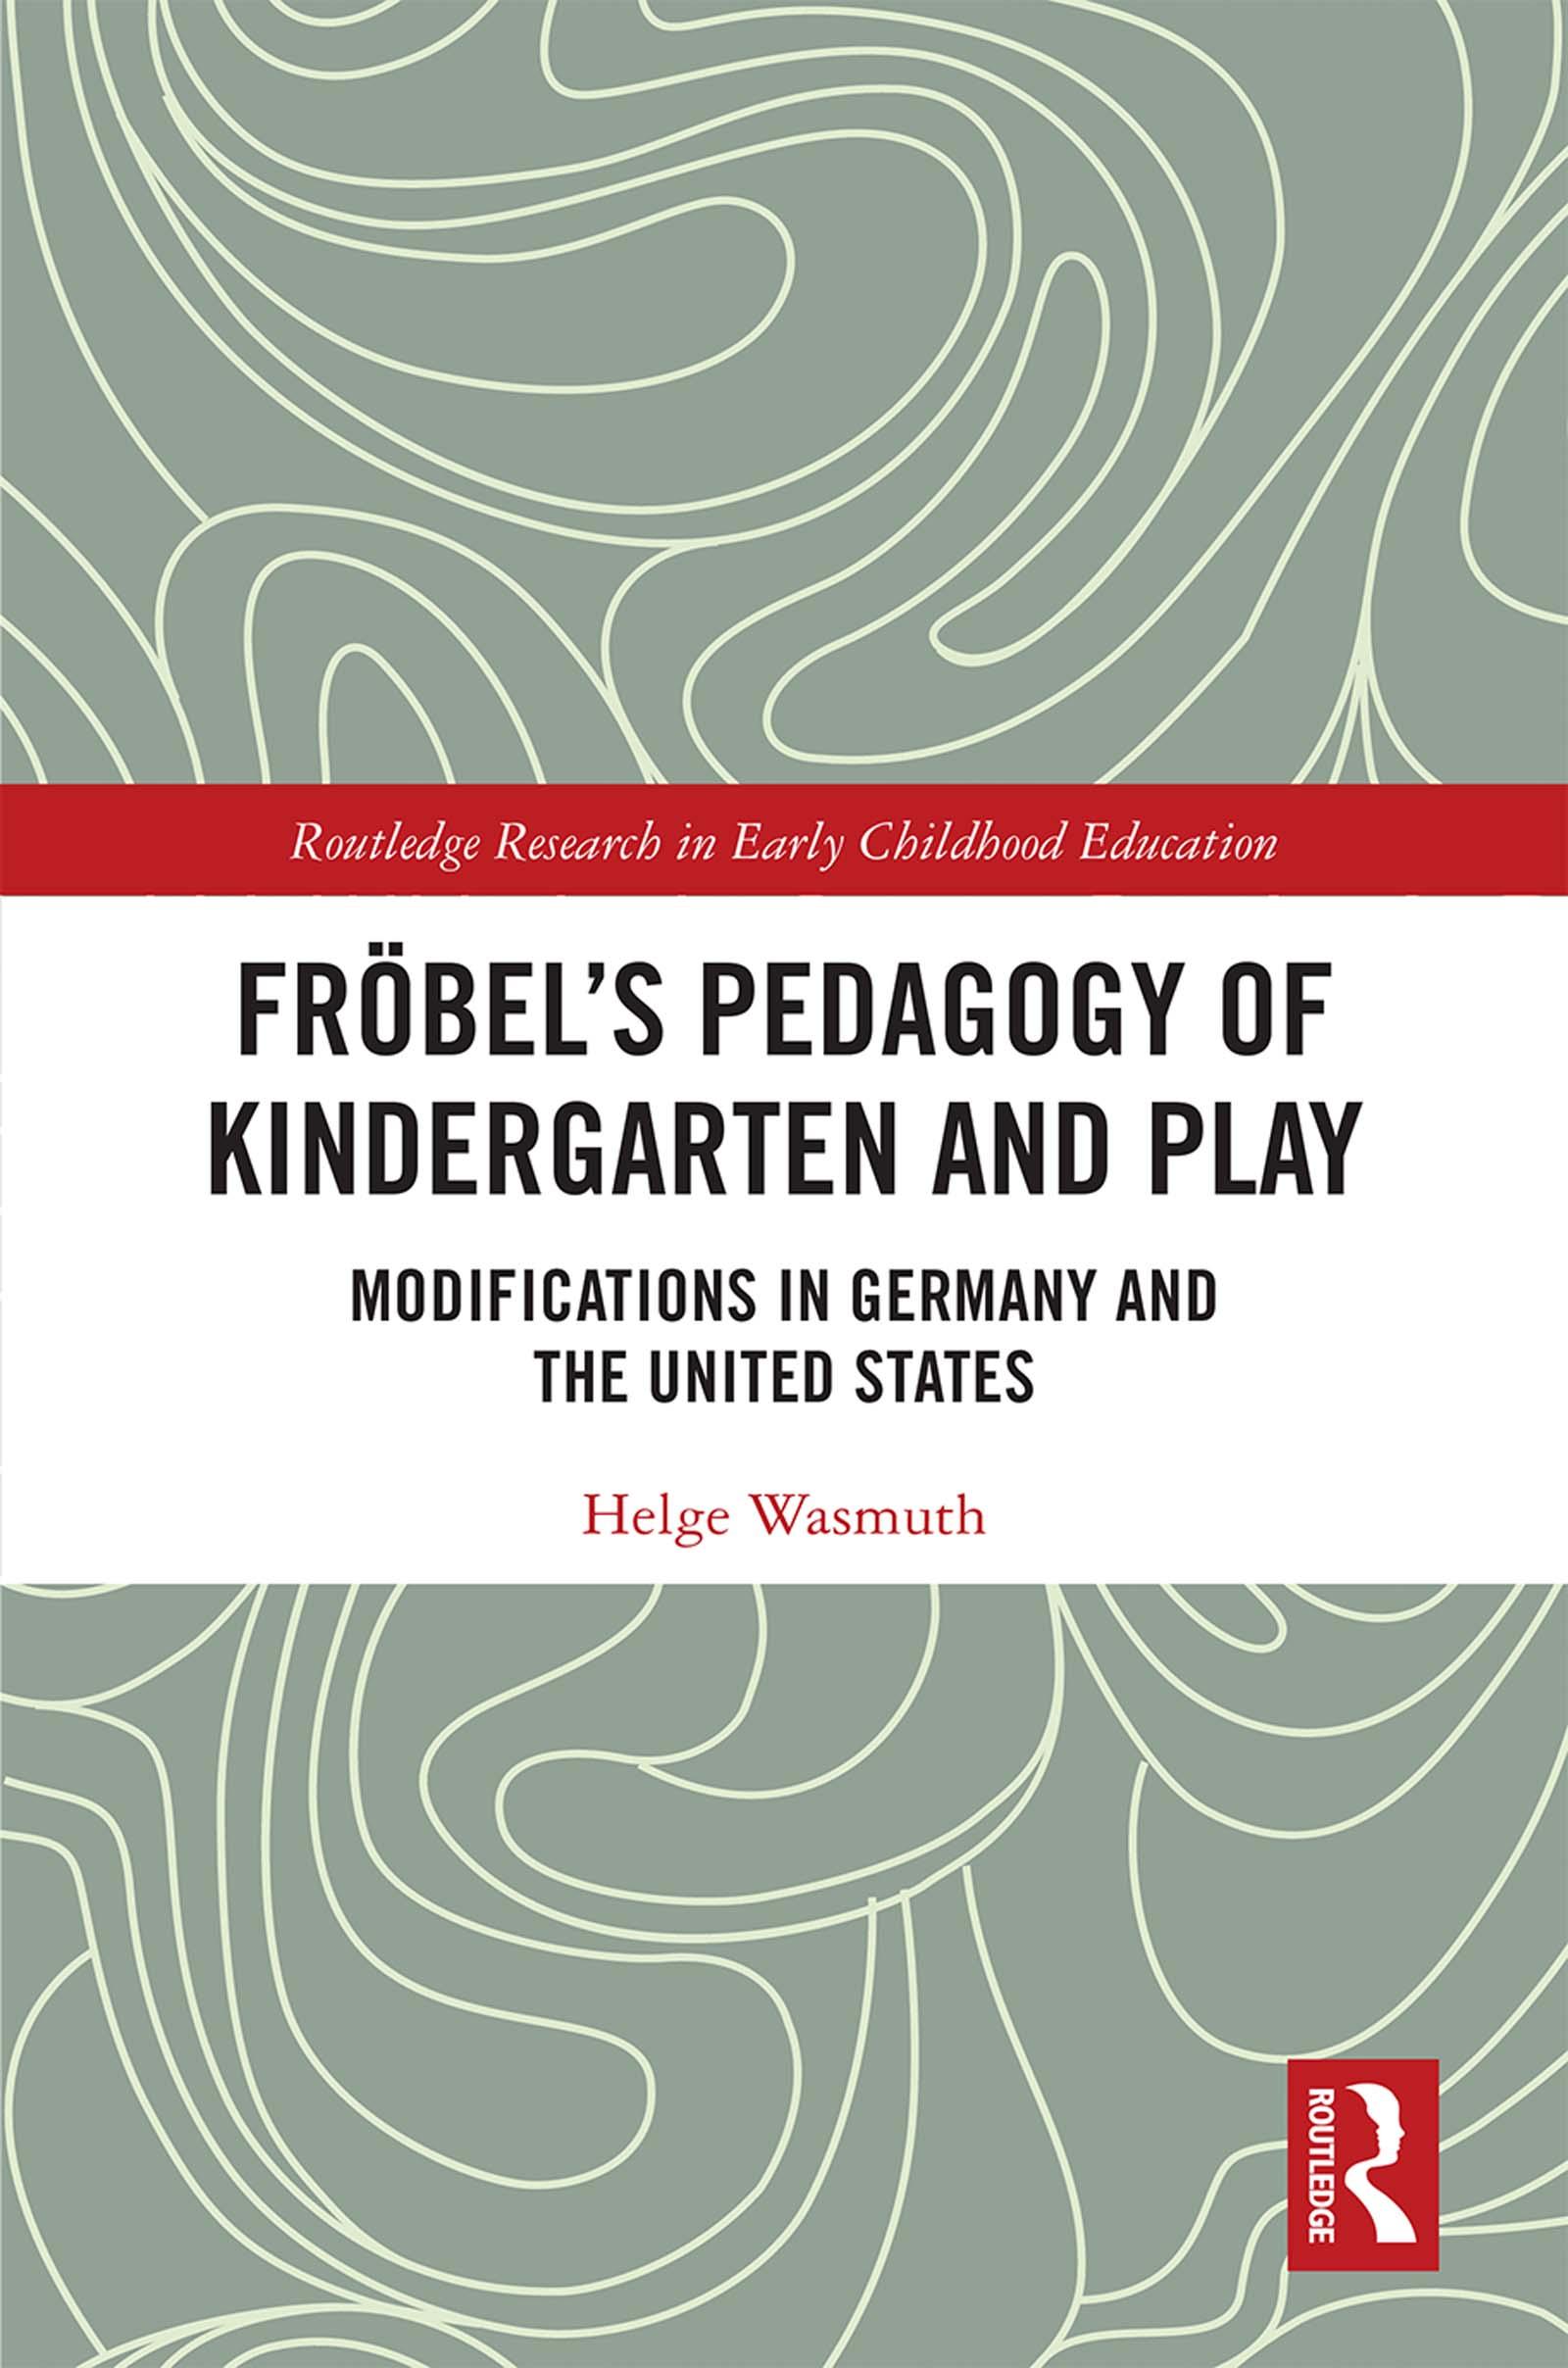 Fröbel's Pedagogy of Kindergarten and Play